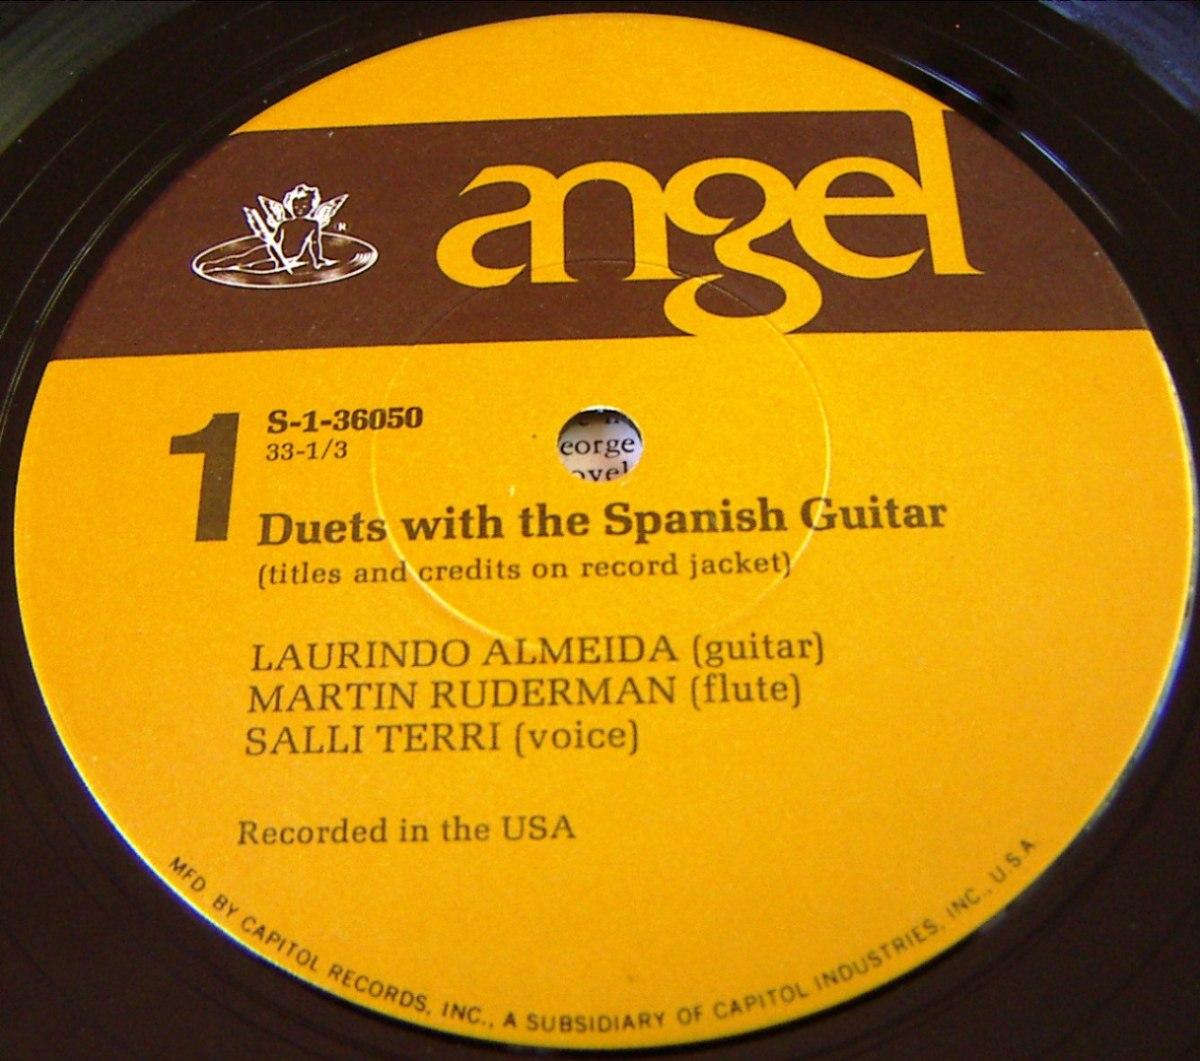 Laurindo Almeida - The Spanish Guitars Of Laurindo Almeida